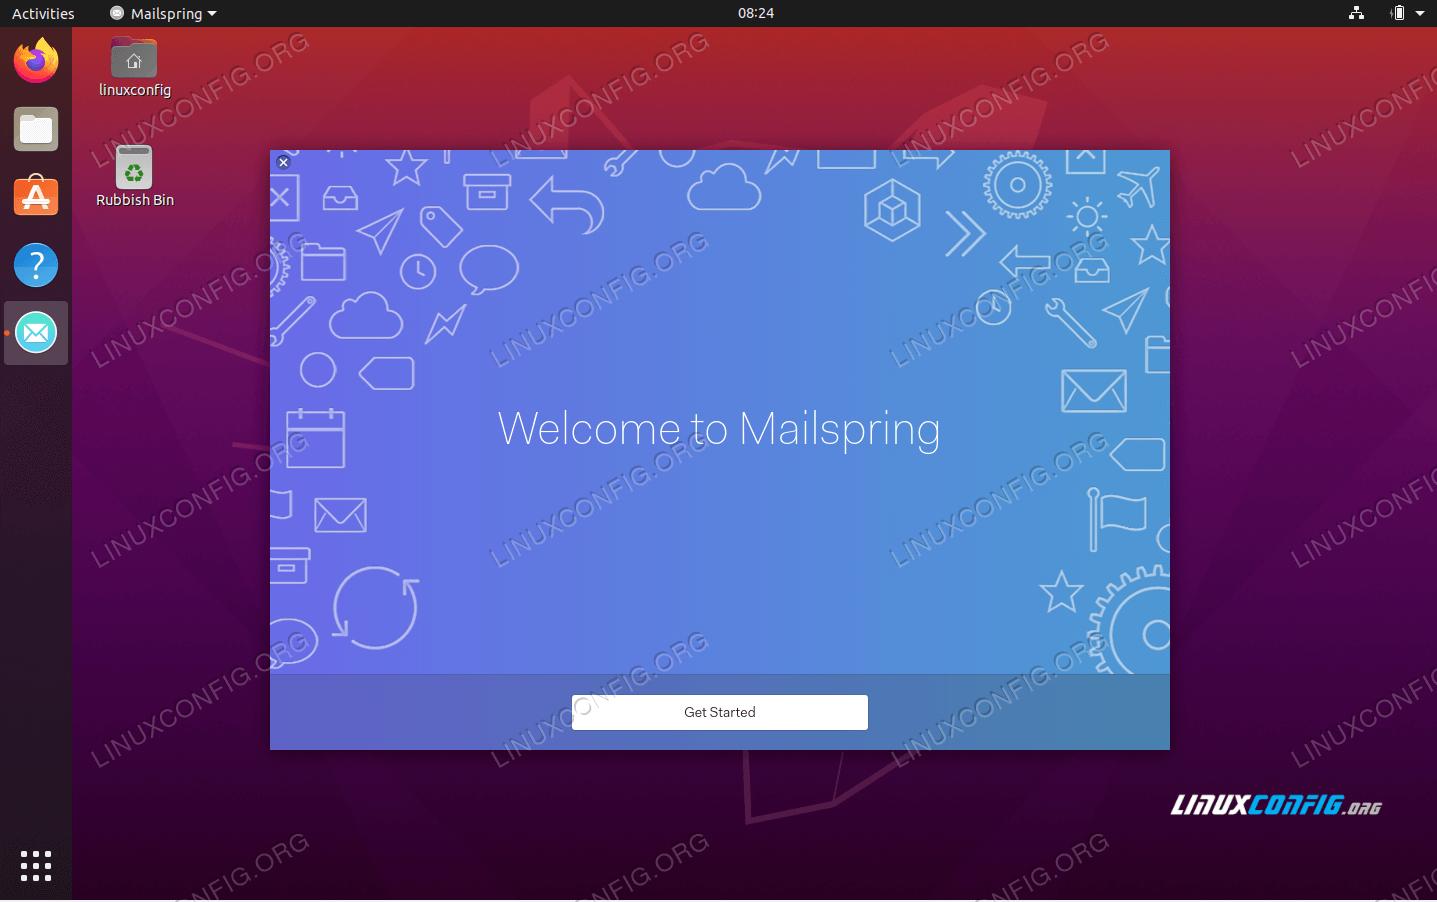 Mailspring installation on Ubuntu 20.04 Focal Fossa